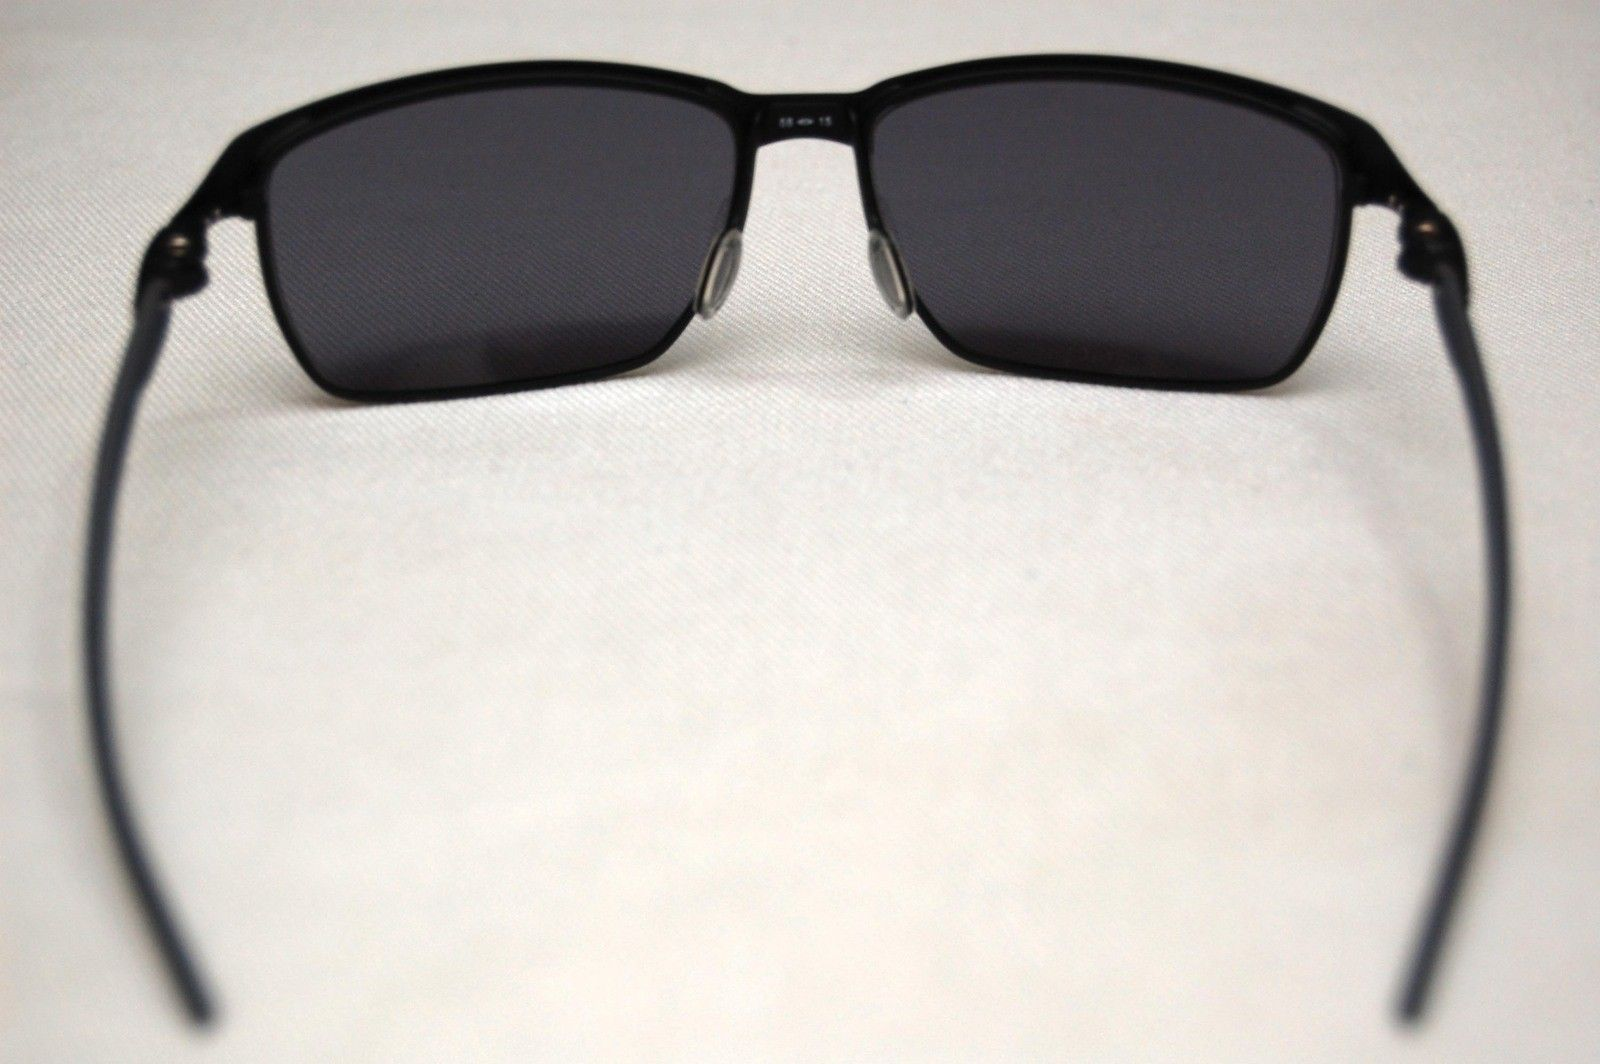 Tinfoil Carbon OO6018-01 Matte Black / Silver | Grey Lens - 02.jpg